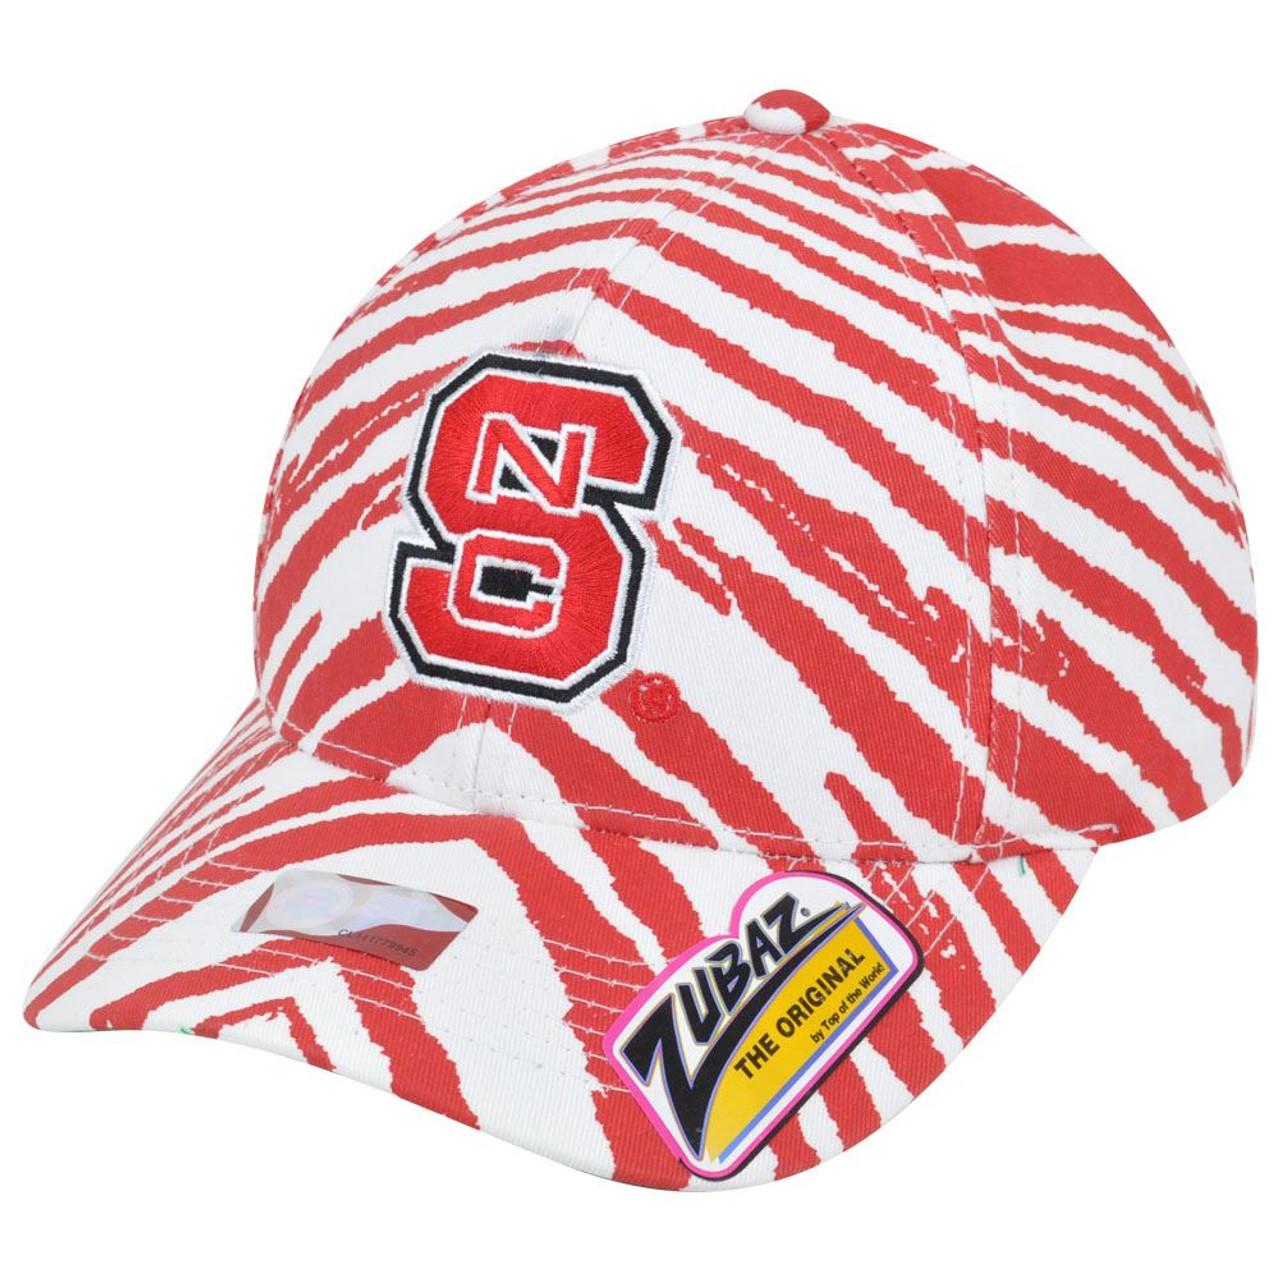 uk availability 269df aefb5 NCAA North Carolina State Wolfpack Top of the World Smash Zubaz Snapback  Hat Cap - Cap Store Online.com